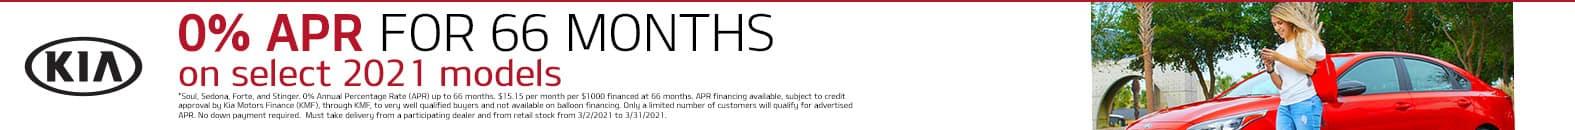 0% APR For 66 Months On Select 2021 Kia Models - Bert Ogden Harlingen Kia in Harlingen, Texas